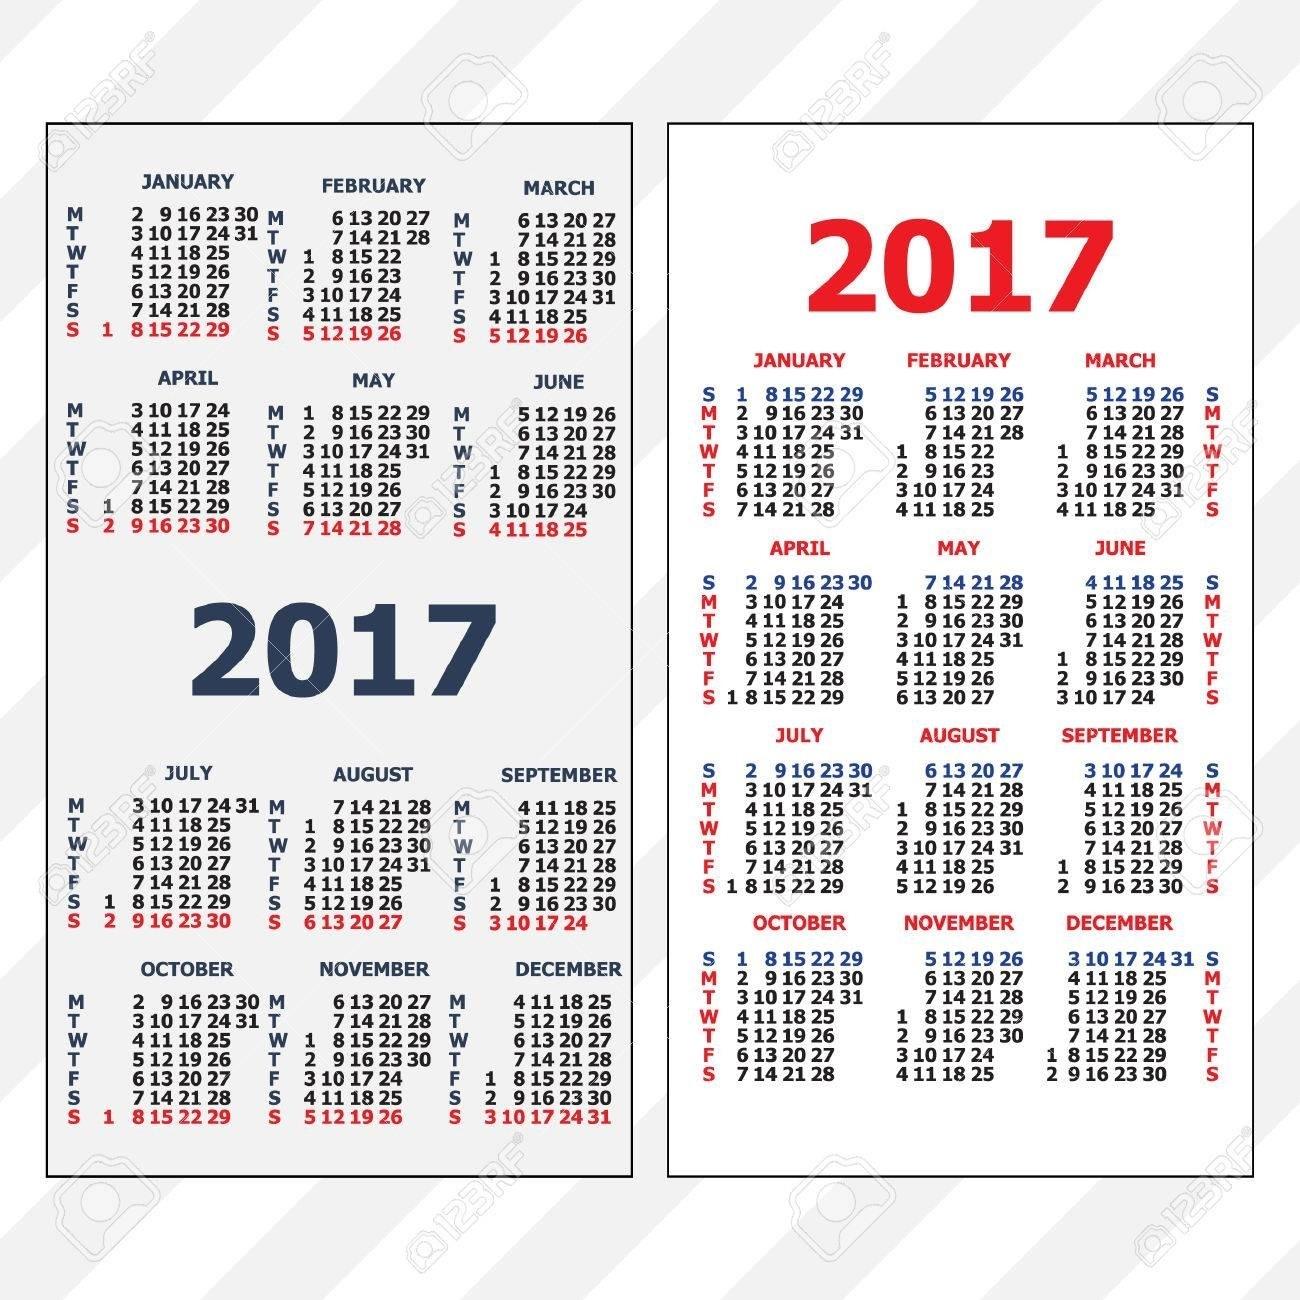 61835390 2017 Pocket Calendar Template Calendar Grid Vertical throughout Grid Of 31 Days Image